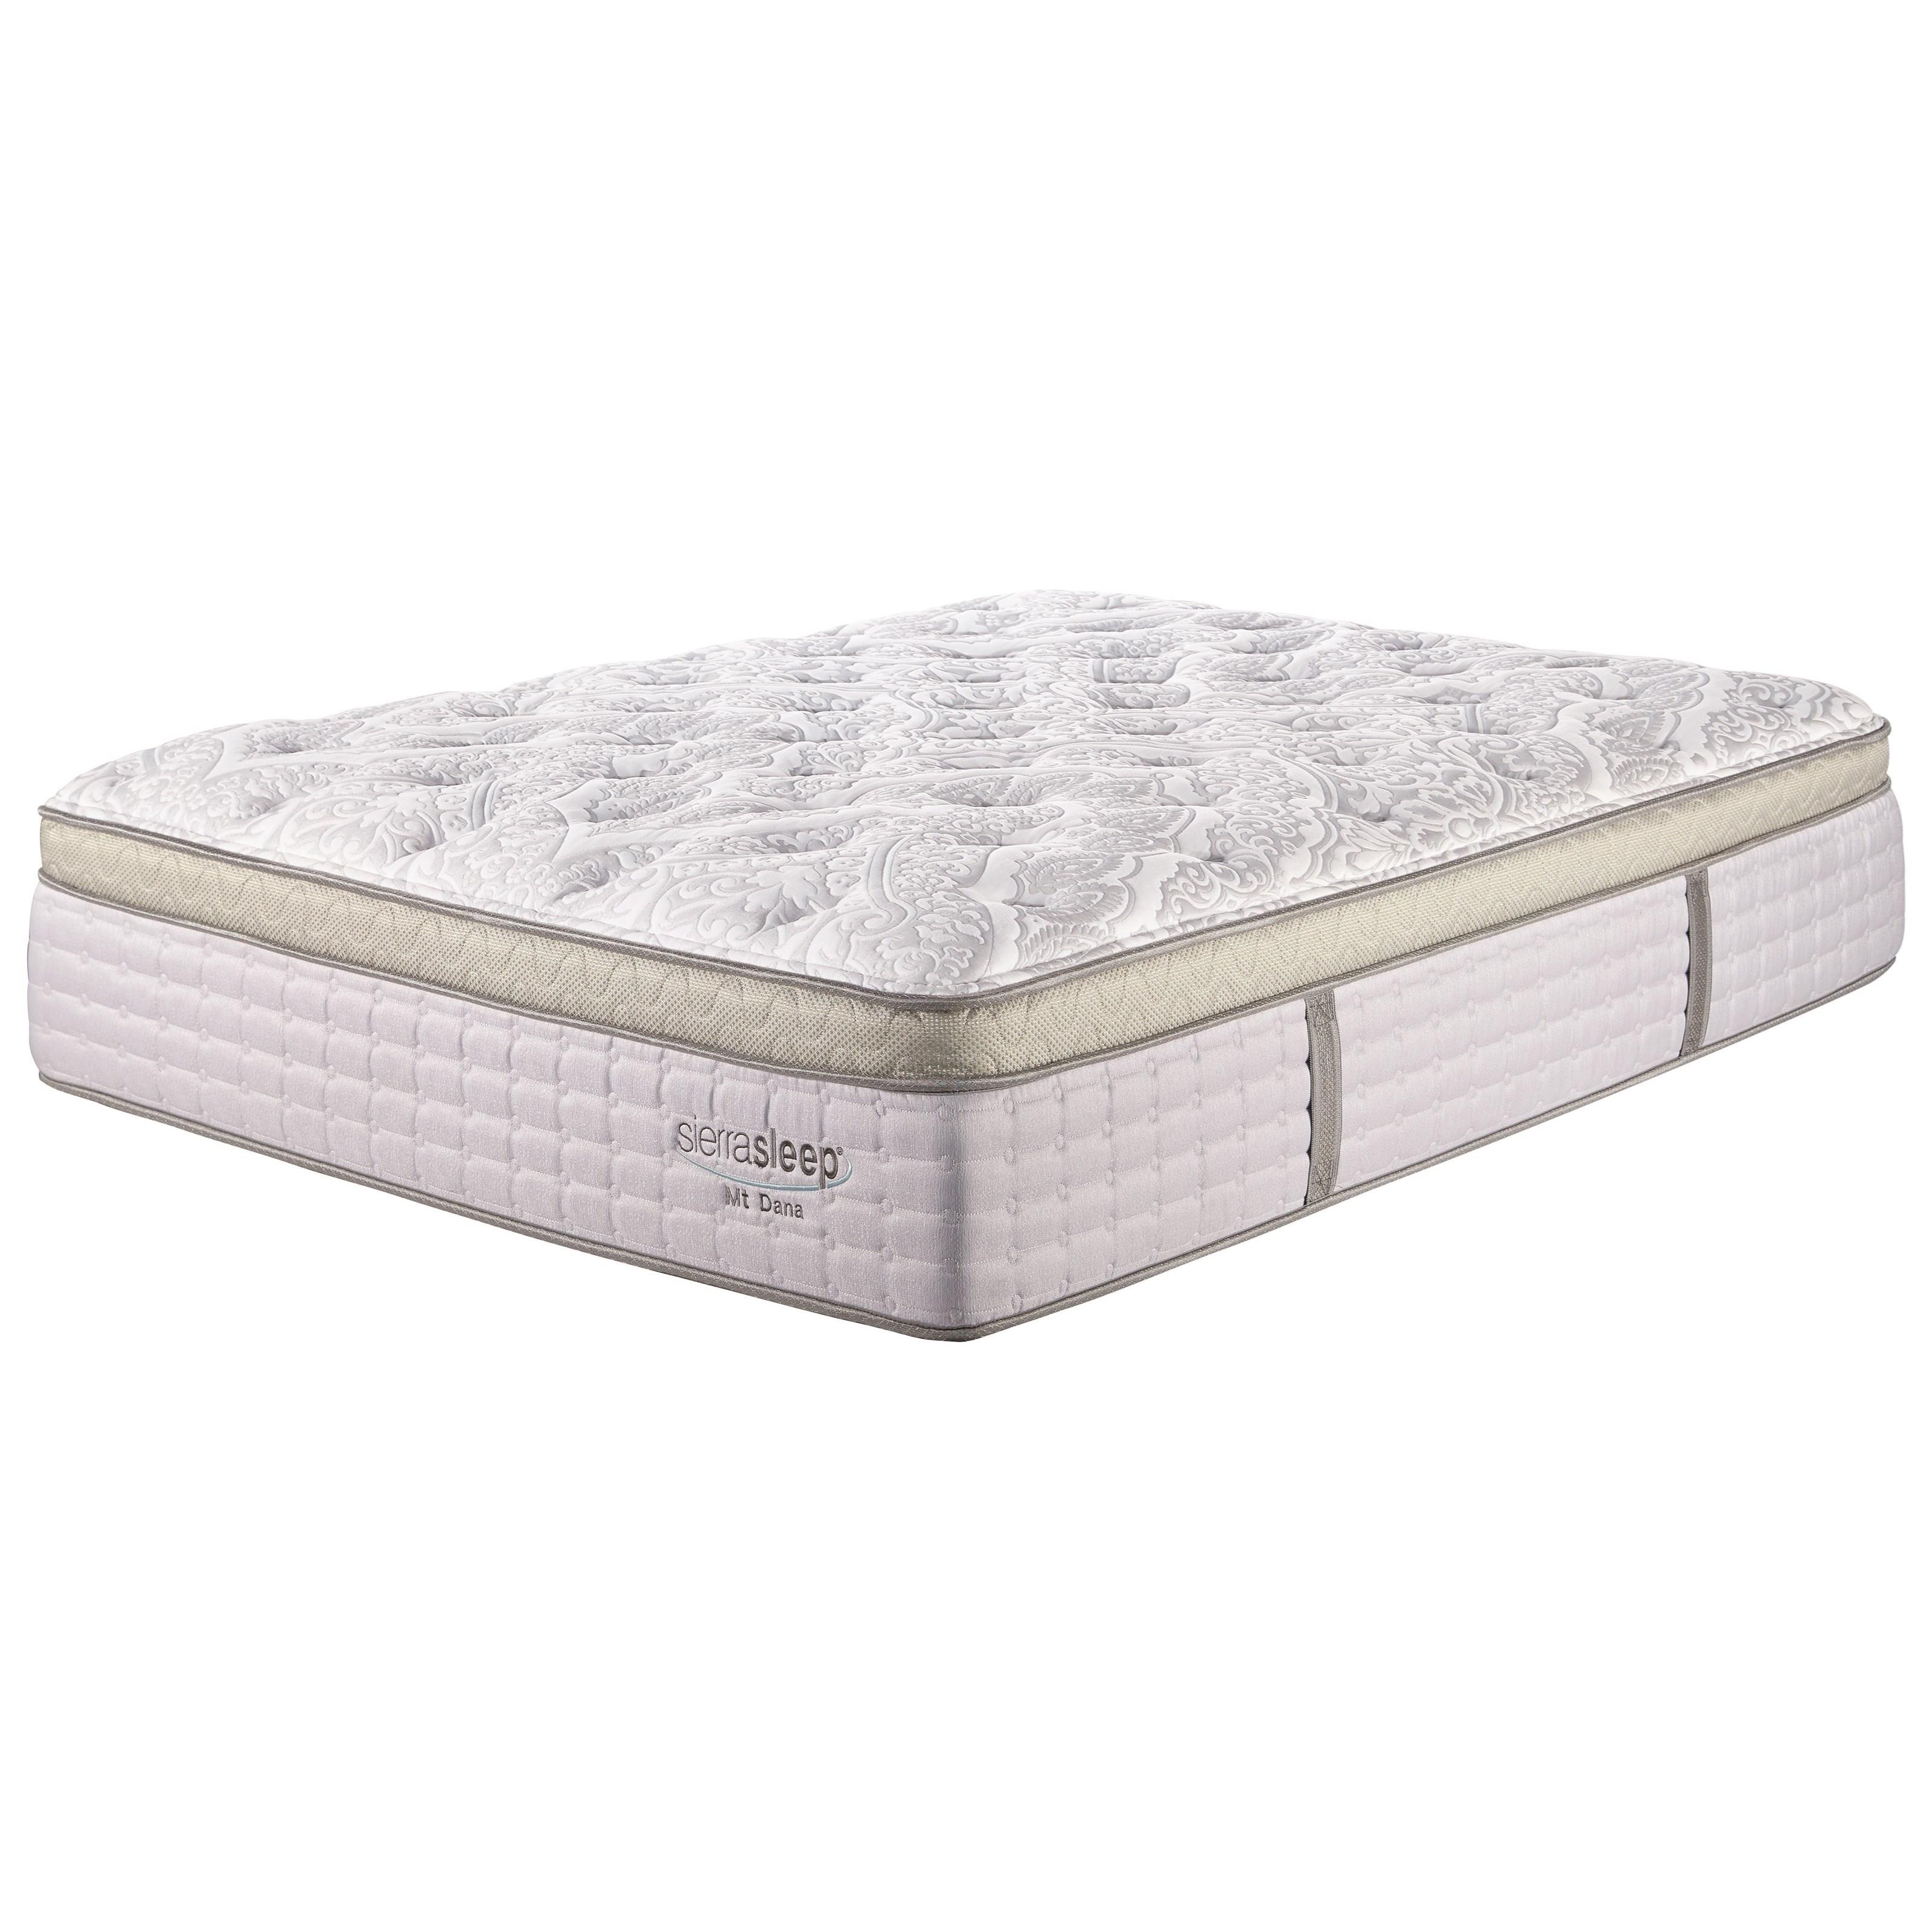 Sierra Sleep Mount Dana Twin Euro Top Mattress - Item Number: M95811